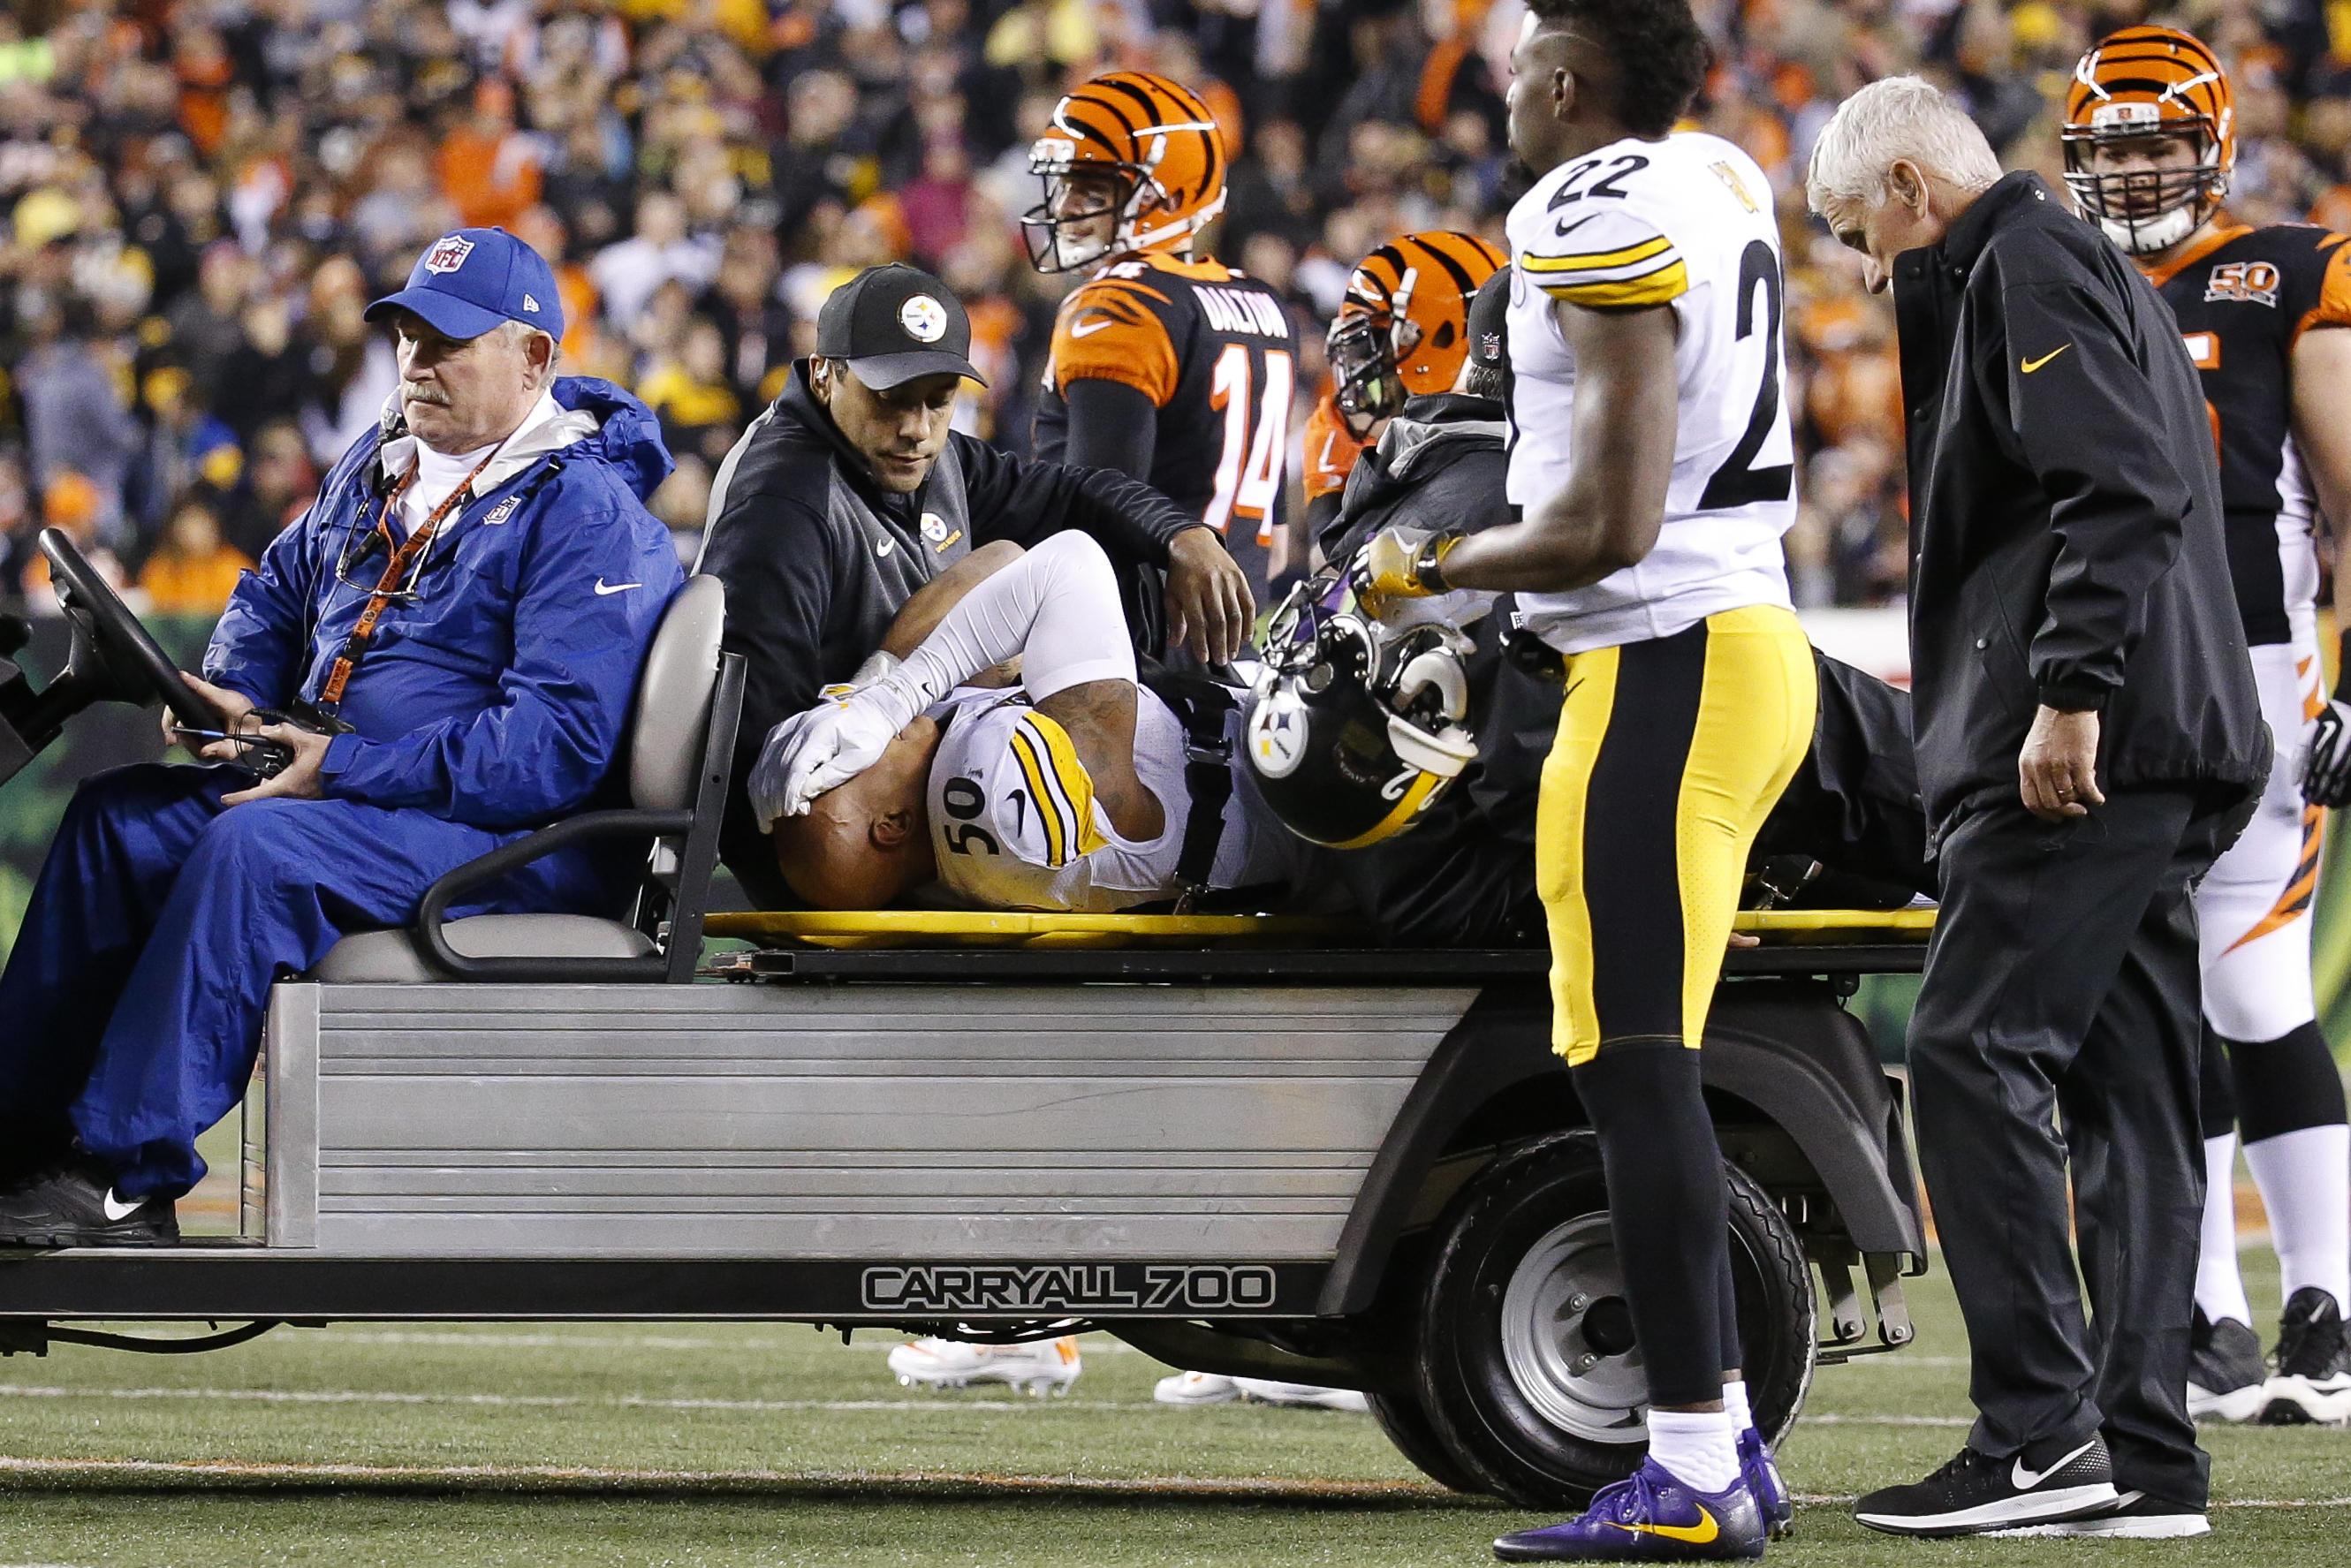 hot sale online 15a9e 7d5af Steelers' Ryan Shazier, Bengals' Vontaze Burfict injured in ...